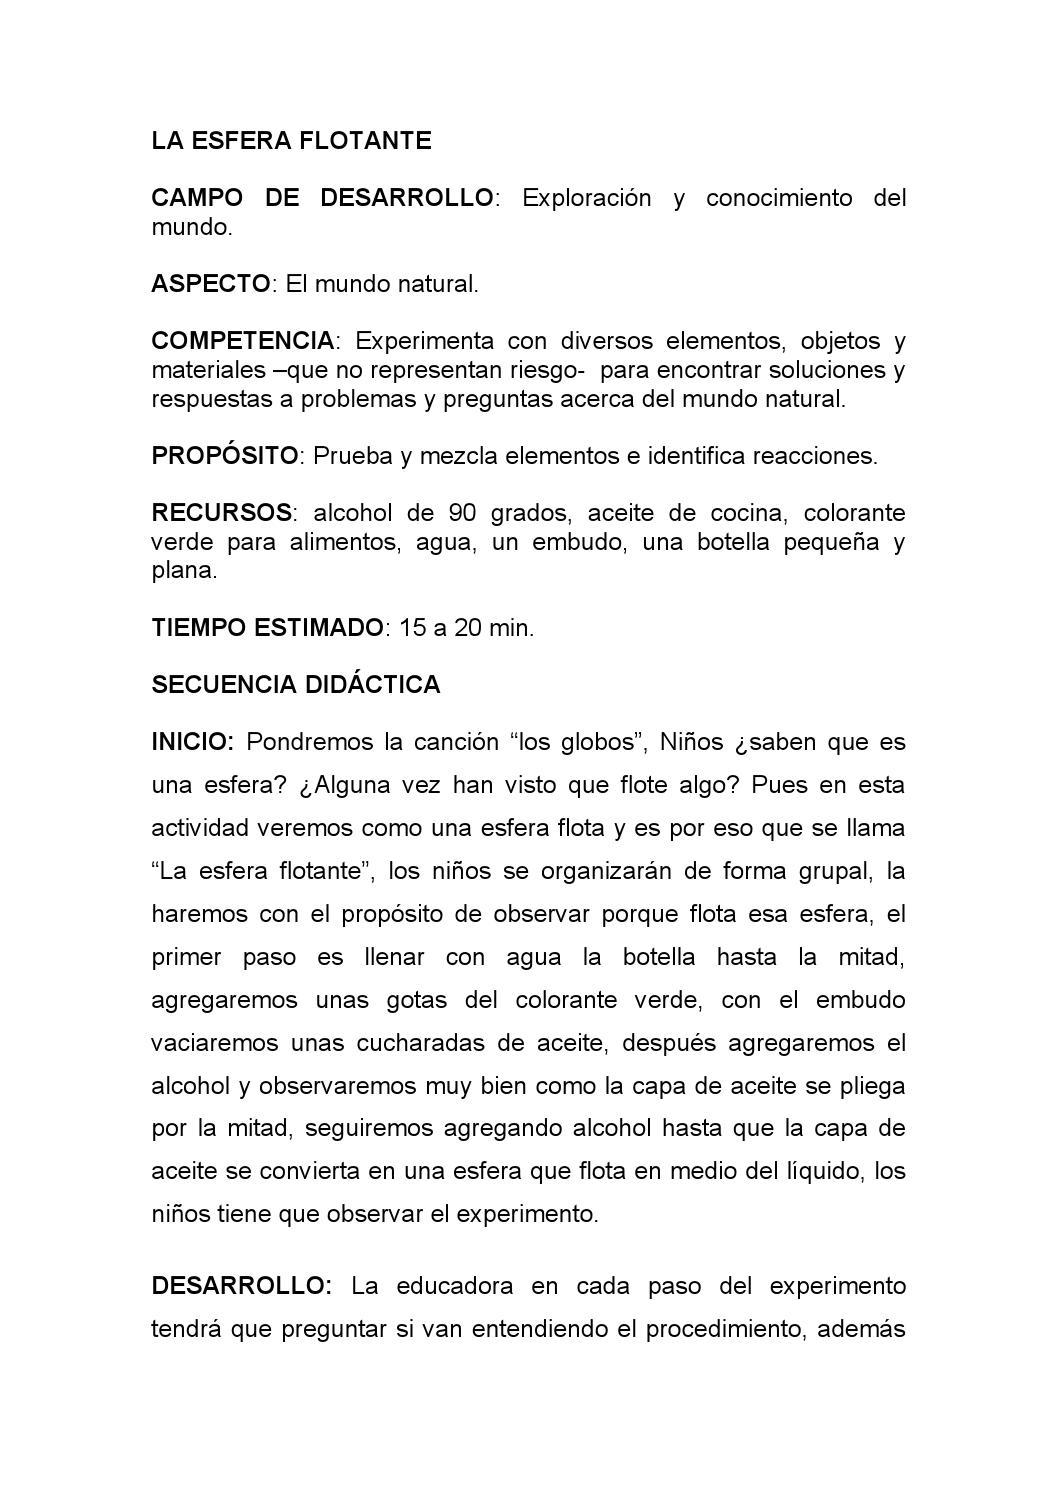 77 Situaciones Didacticas By Gabrielita Reyes Issuu